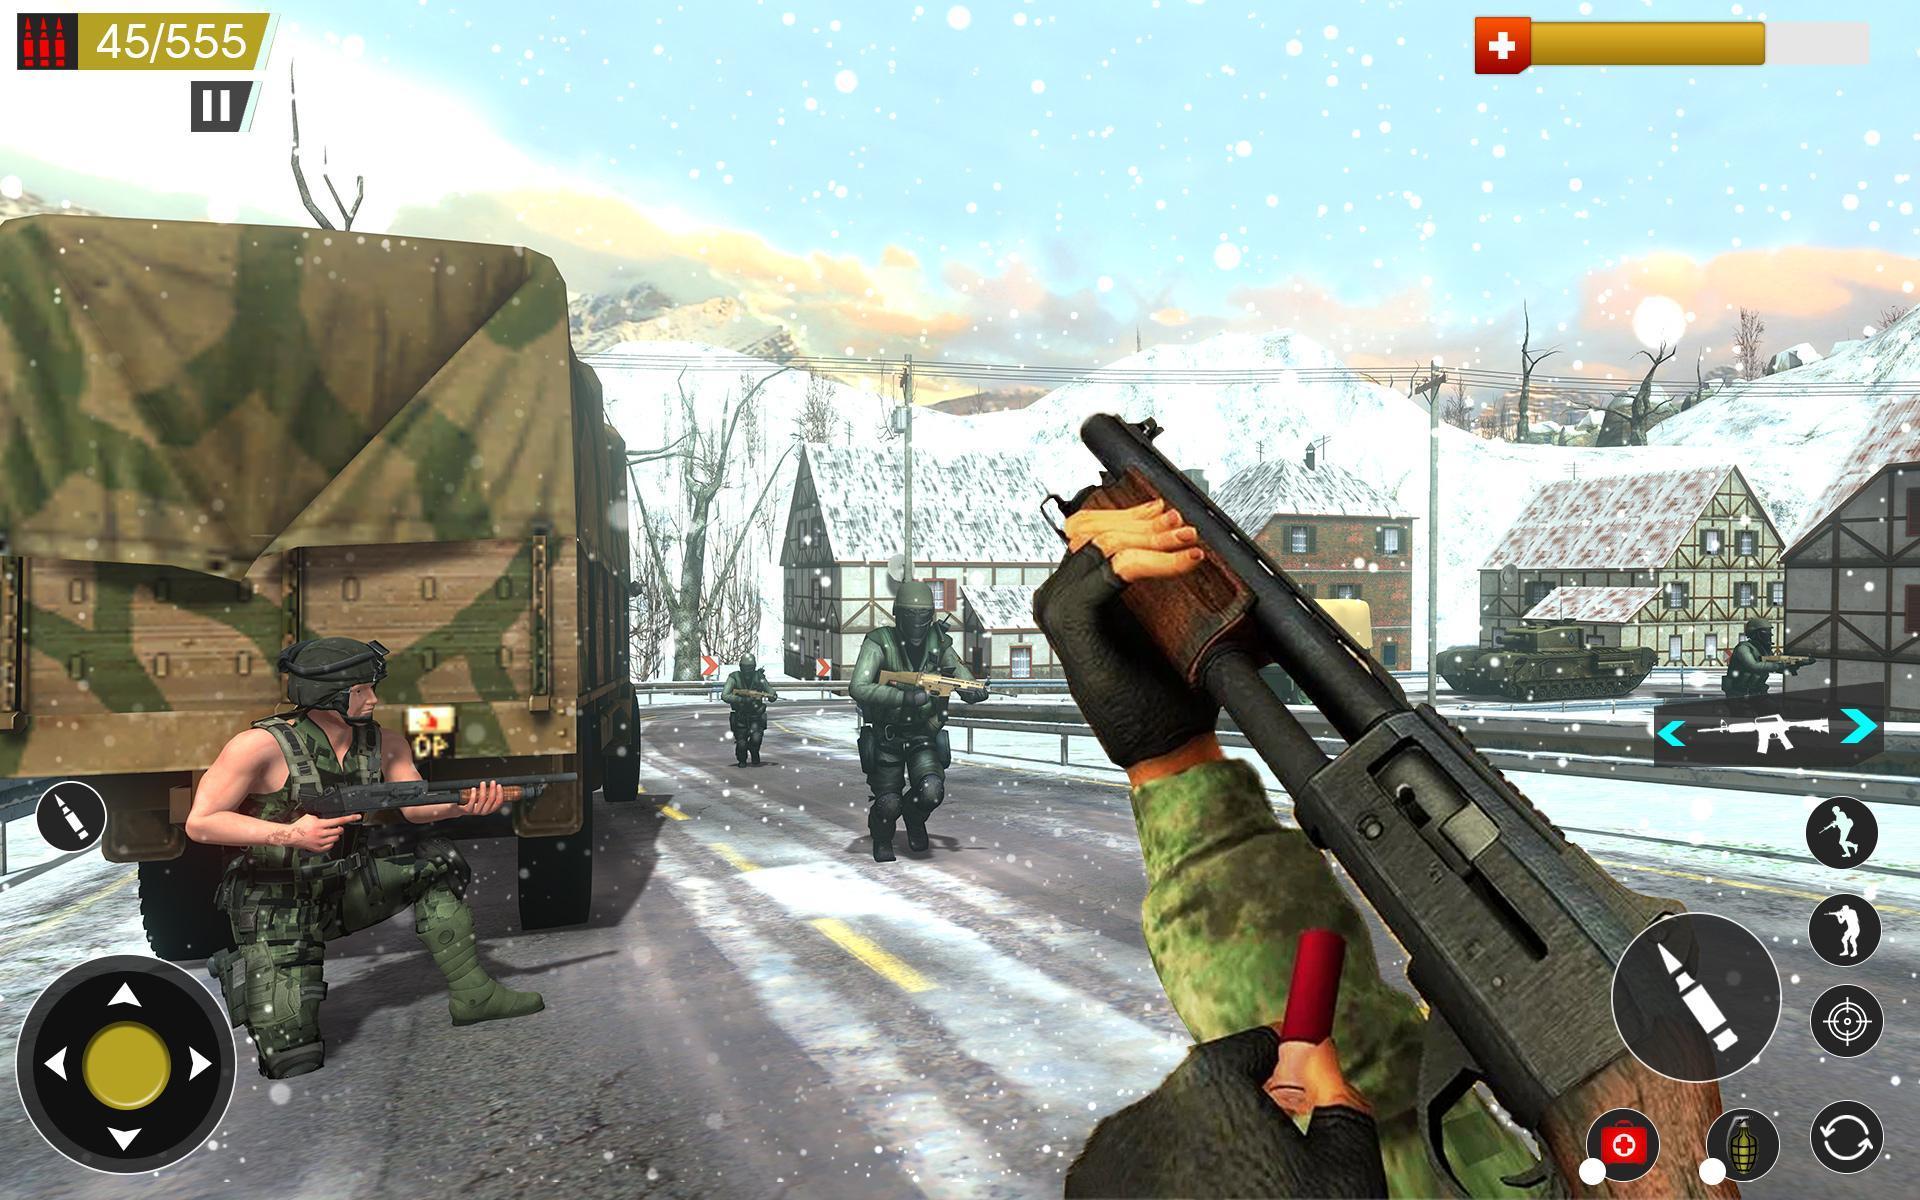 American World War Fps Shooter Free Shooting Games 4.8 Screenshot 18